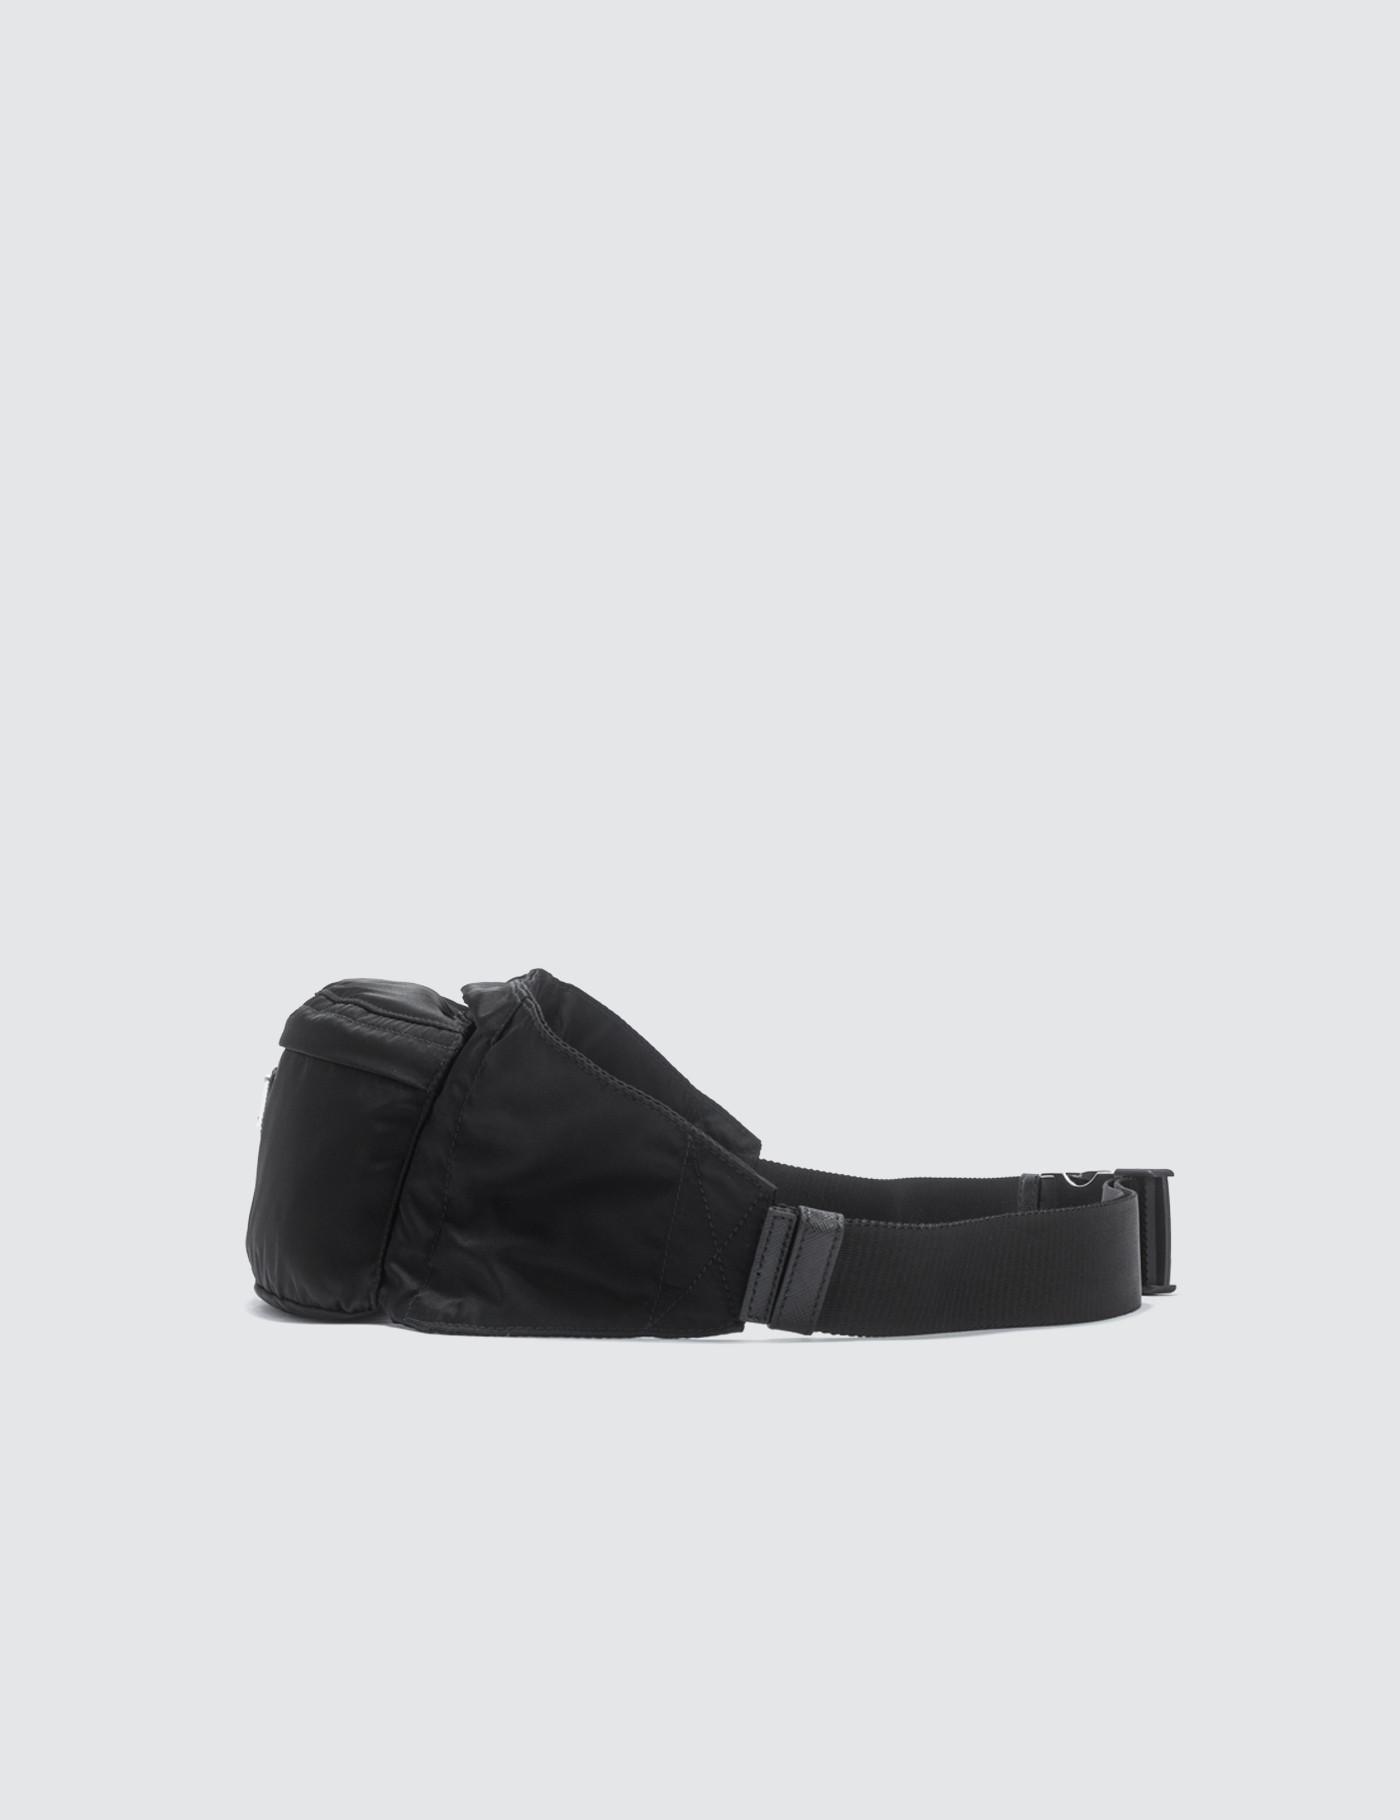 a28c4f06cea8 Prada Zip Long Fanny Pack in Black for Men - Lyst